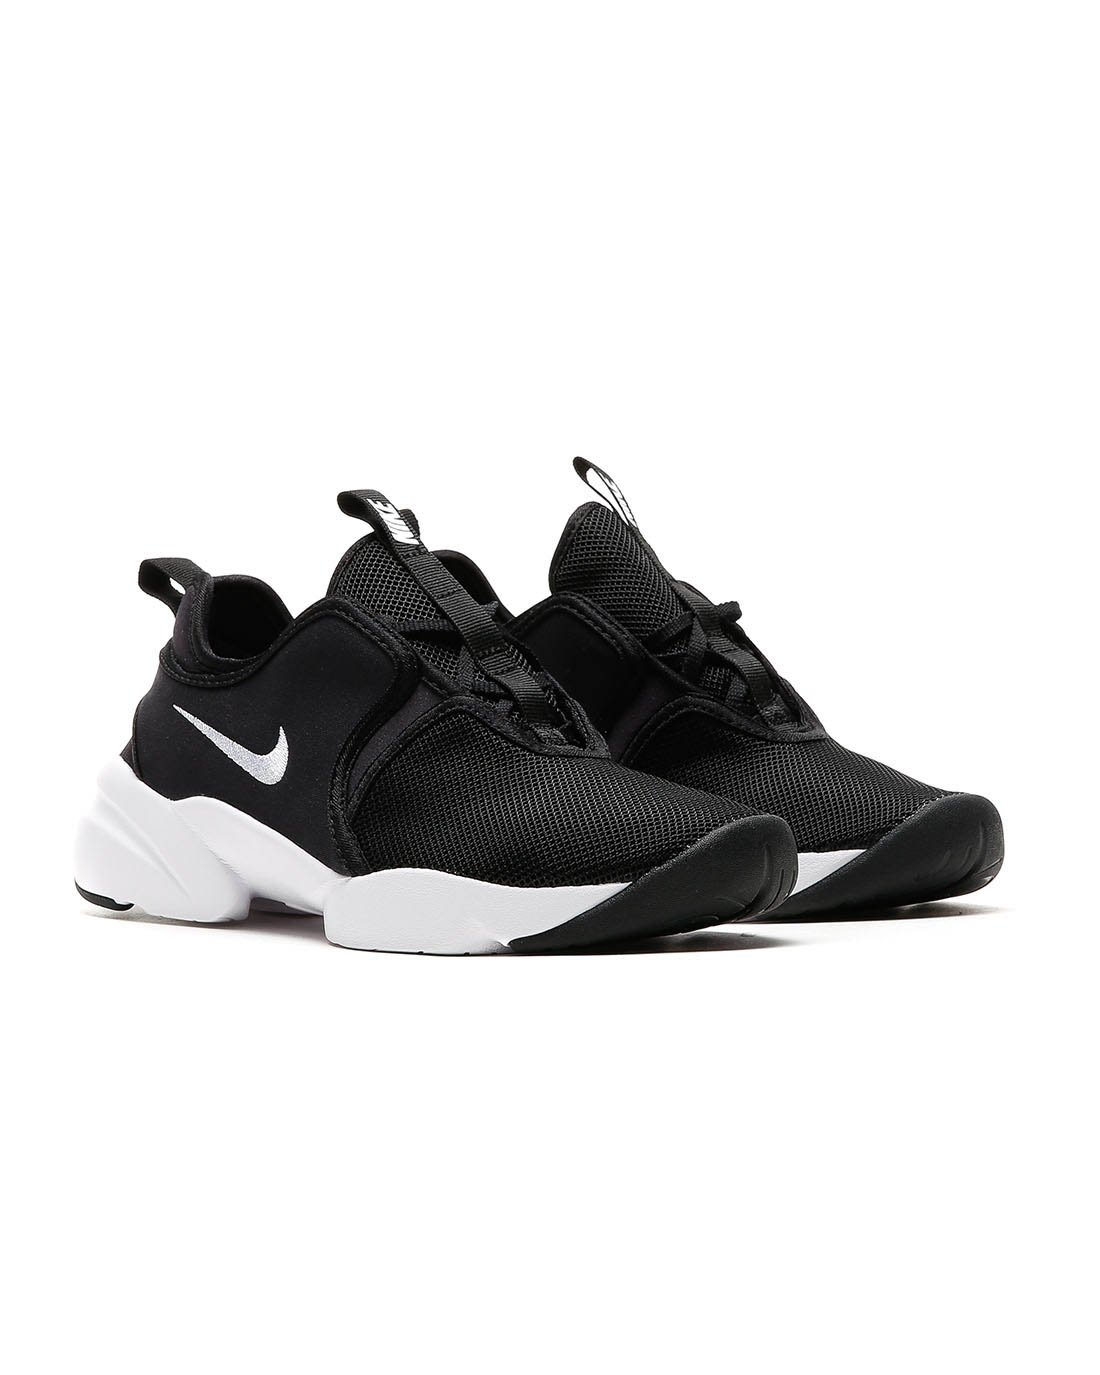 W Nike Loden Trail 001 De blackwhitewhite Noir Femme Chaussures ZzzndwxWq